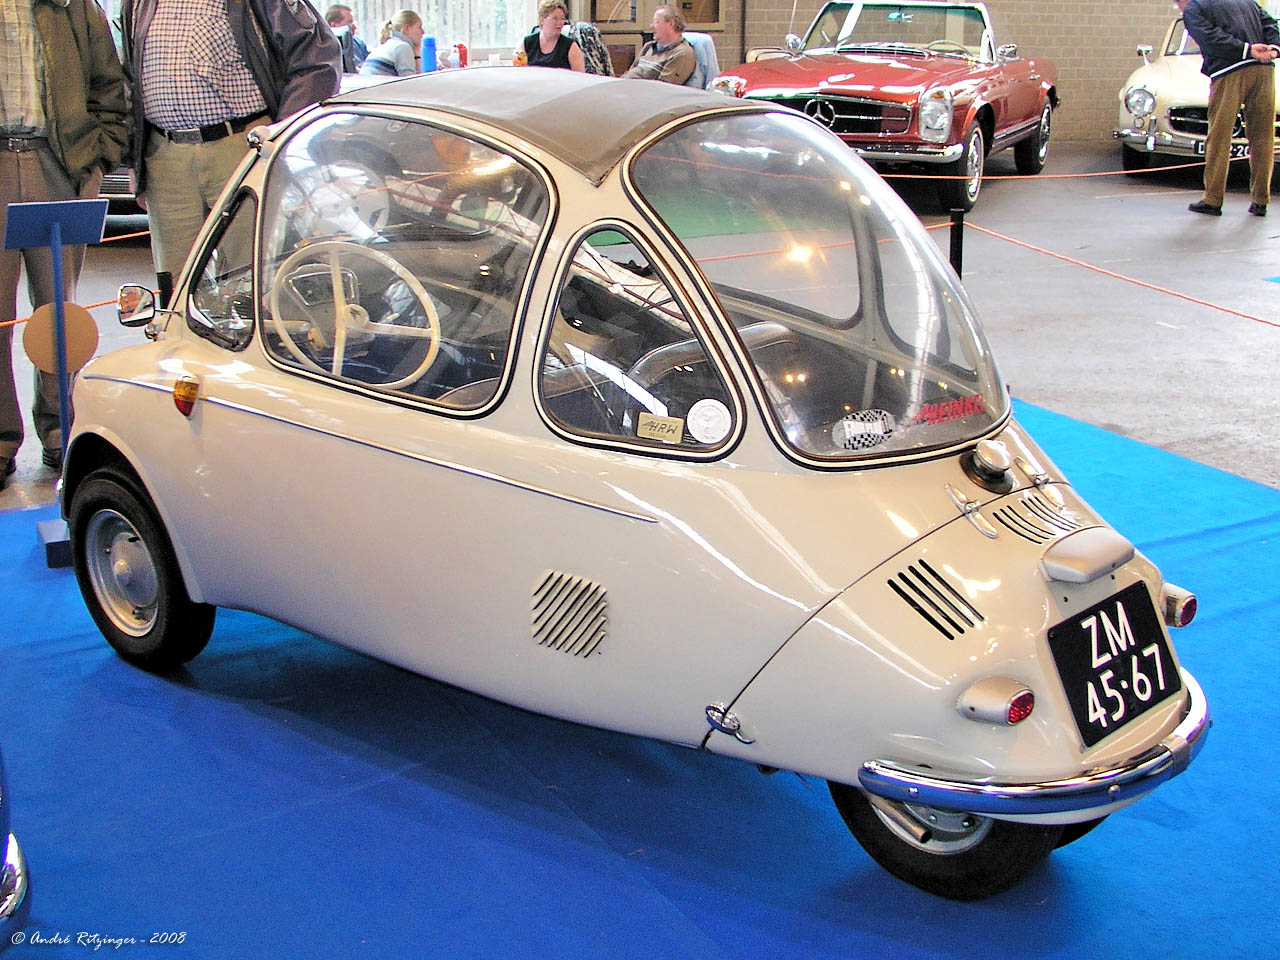 Los Messerschmitt alemanes